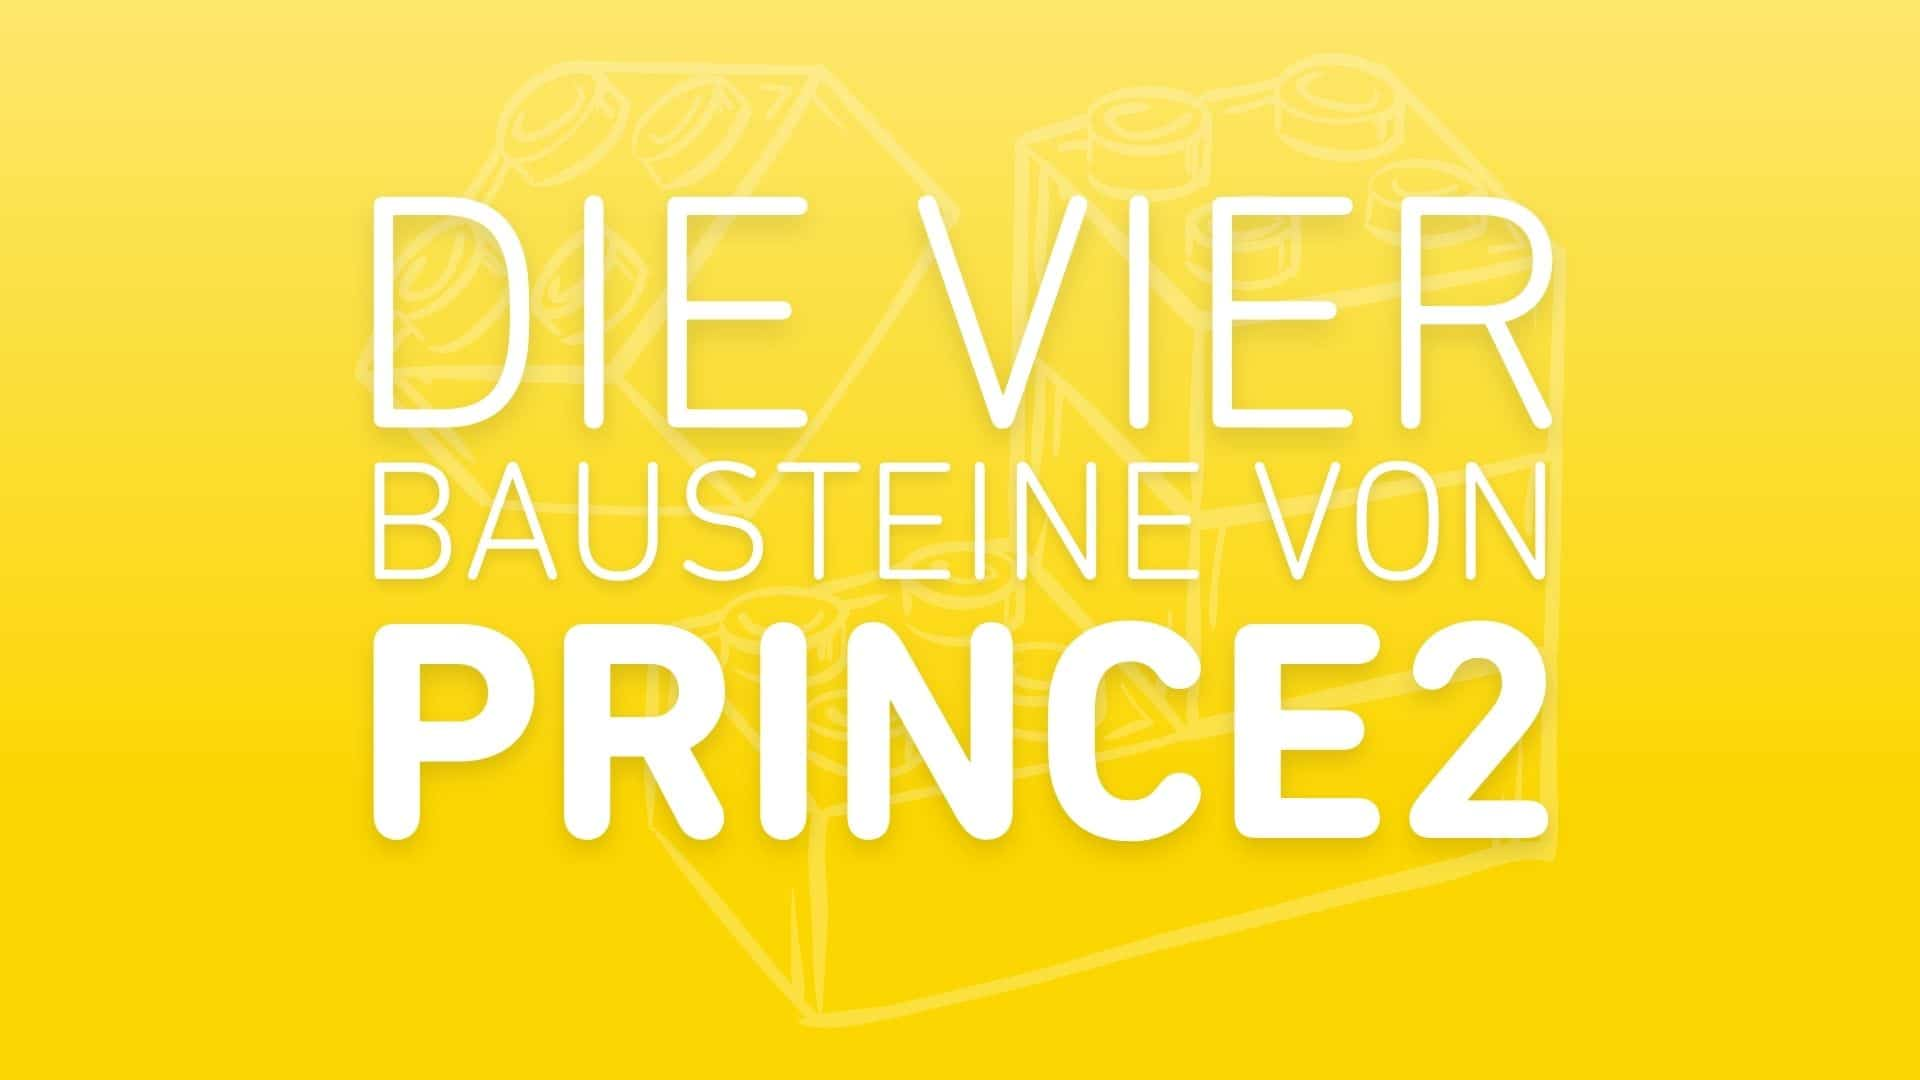 prince2-bausteine